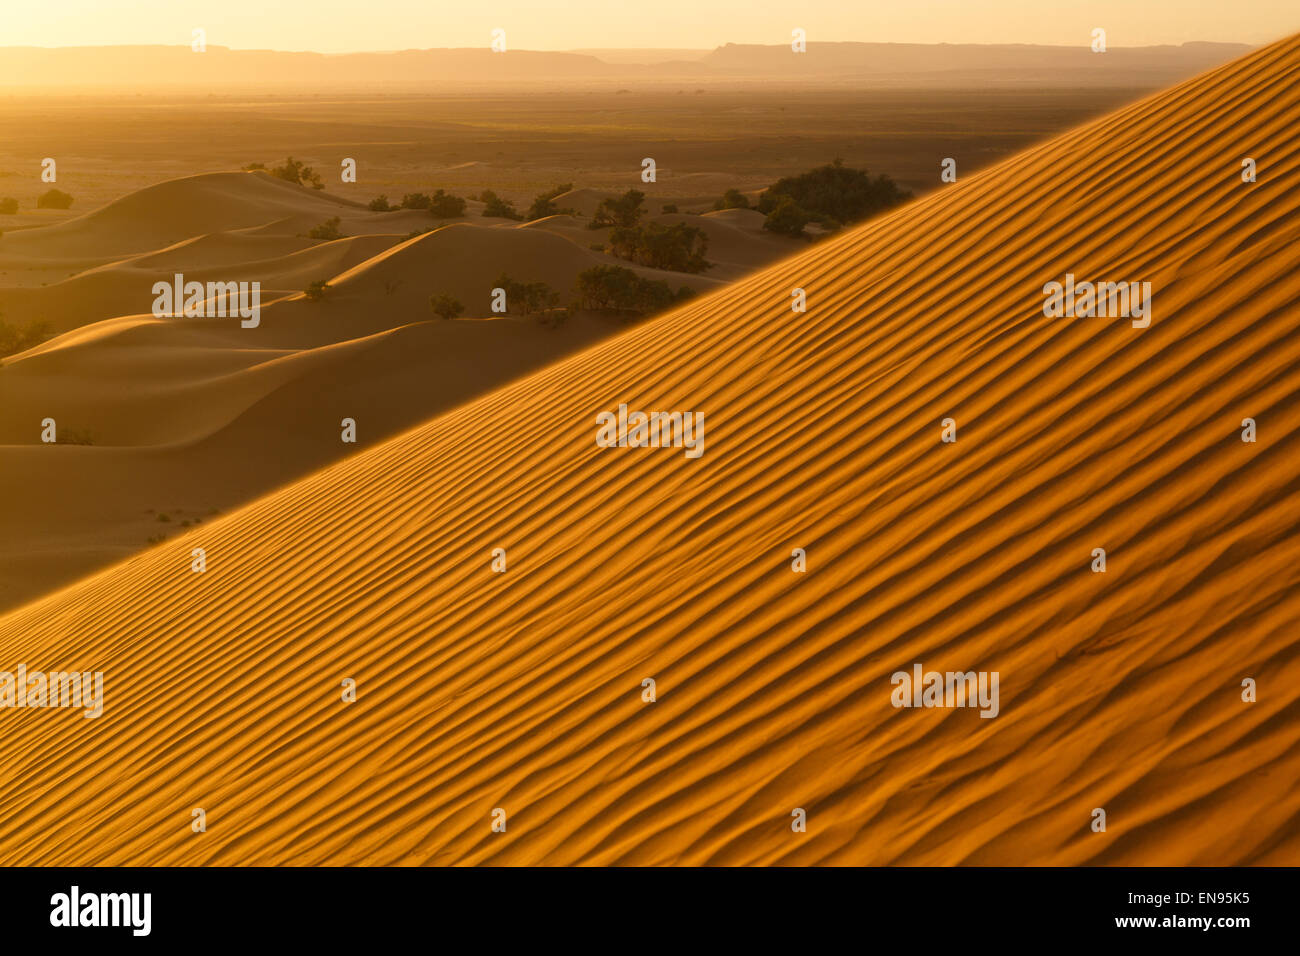 Sand dunes. Lihoudi dunes. Sahara desert. Morocco. - Stock Image